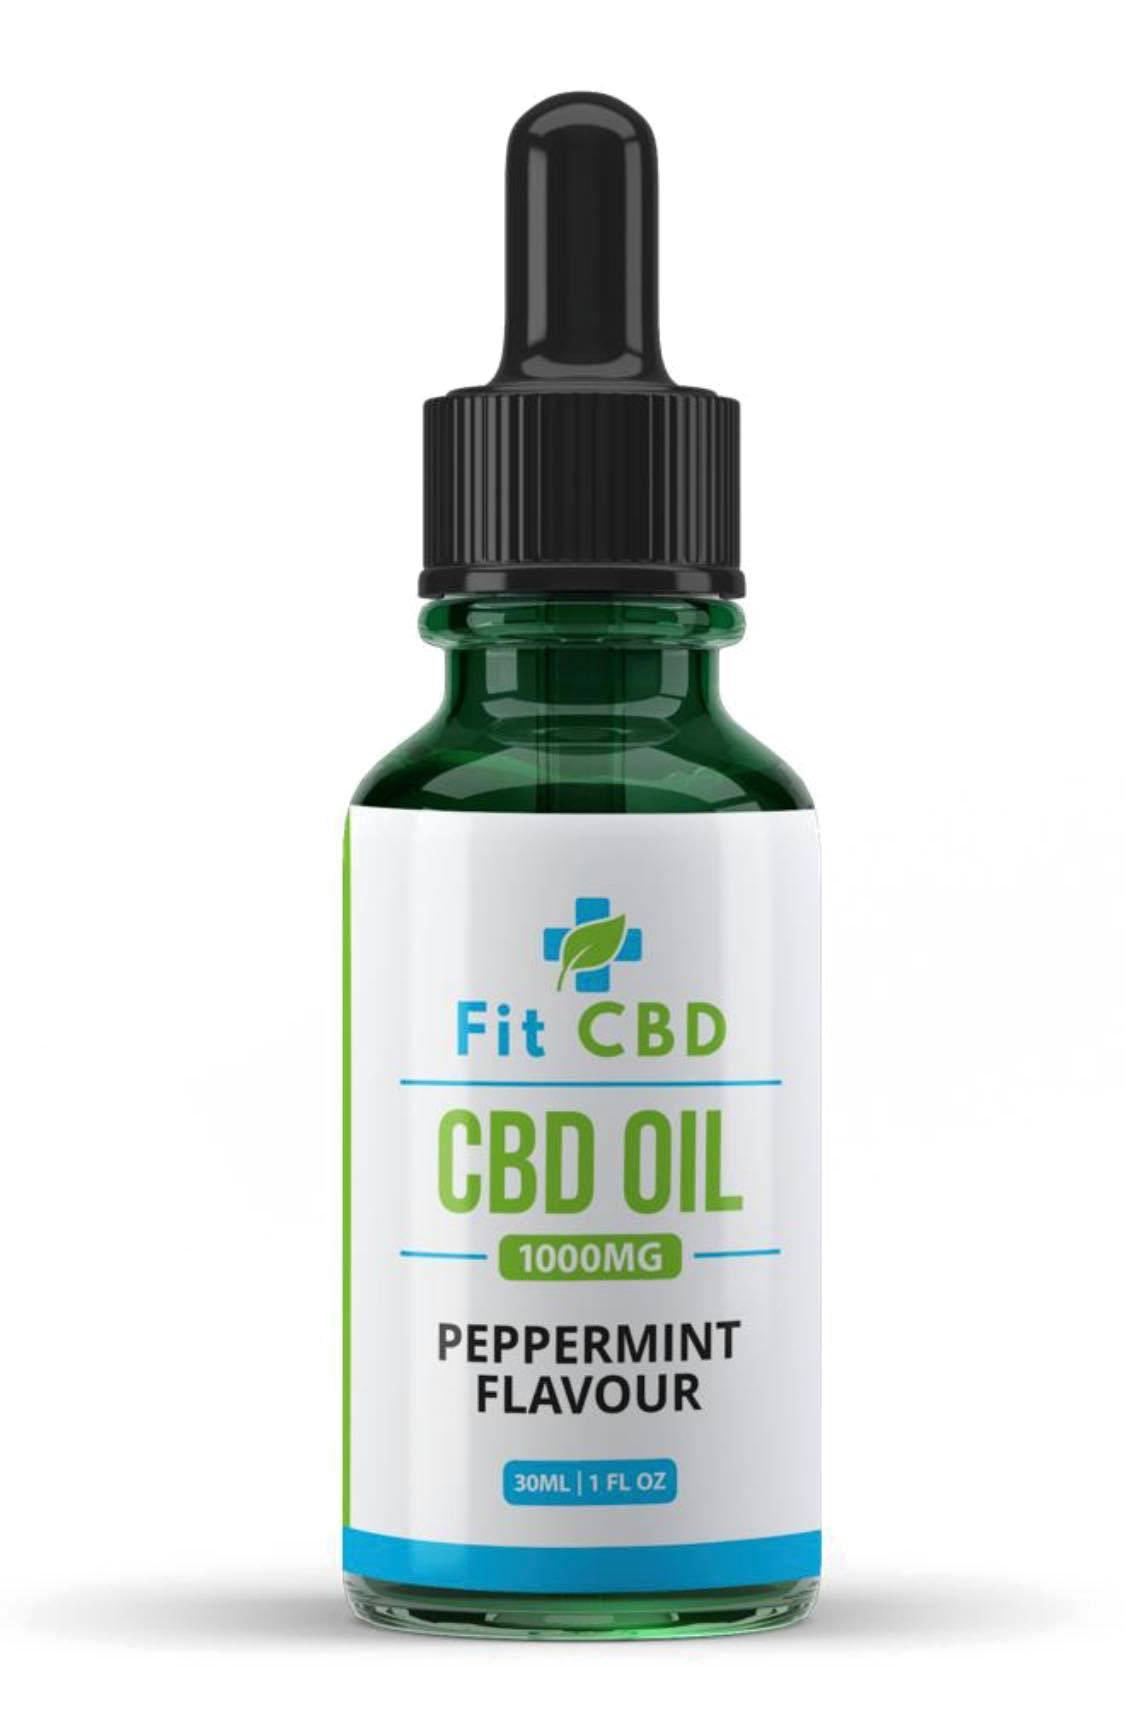 Fit CBD Tincture Oil 1000mg CBD Peppermint 30ml